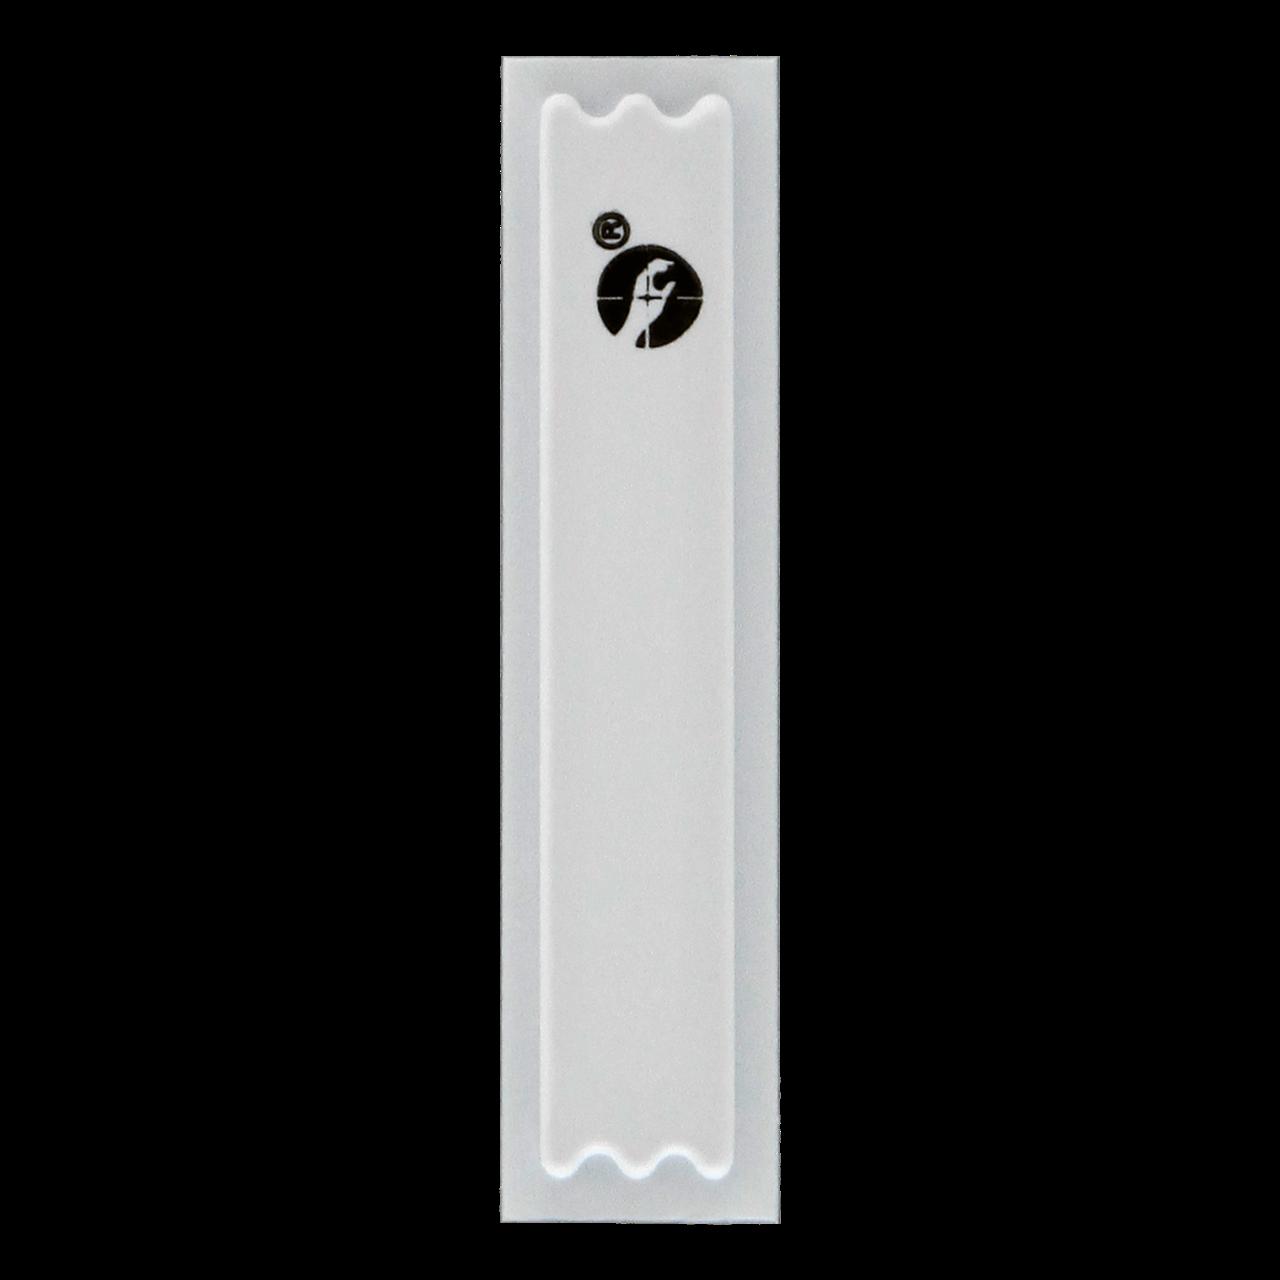 Sensormatic Ultra•Strip III Microwavable Roll Label in Armenia, Vantag LLC